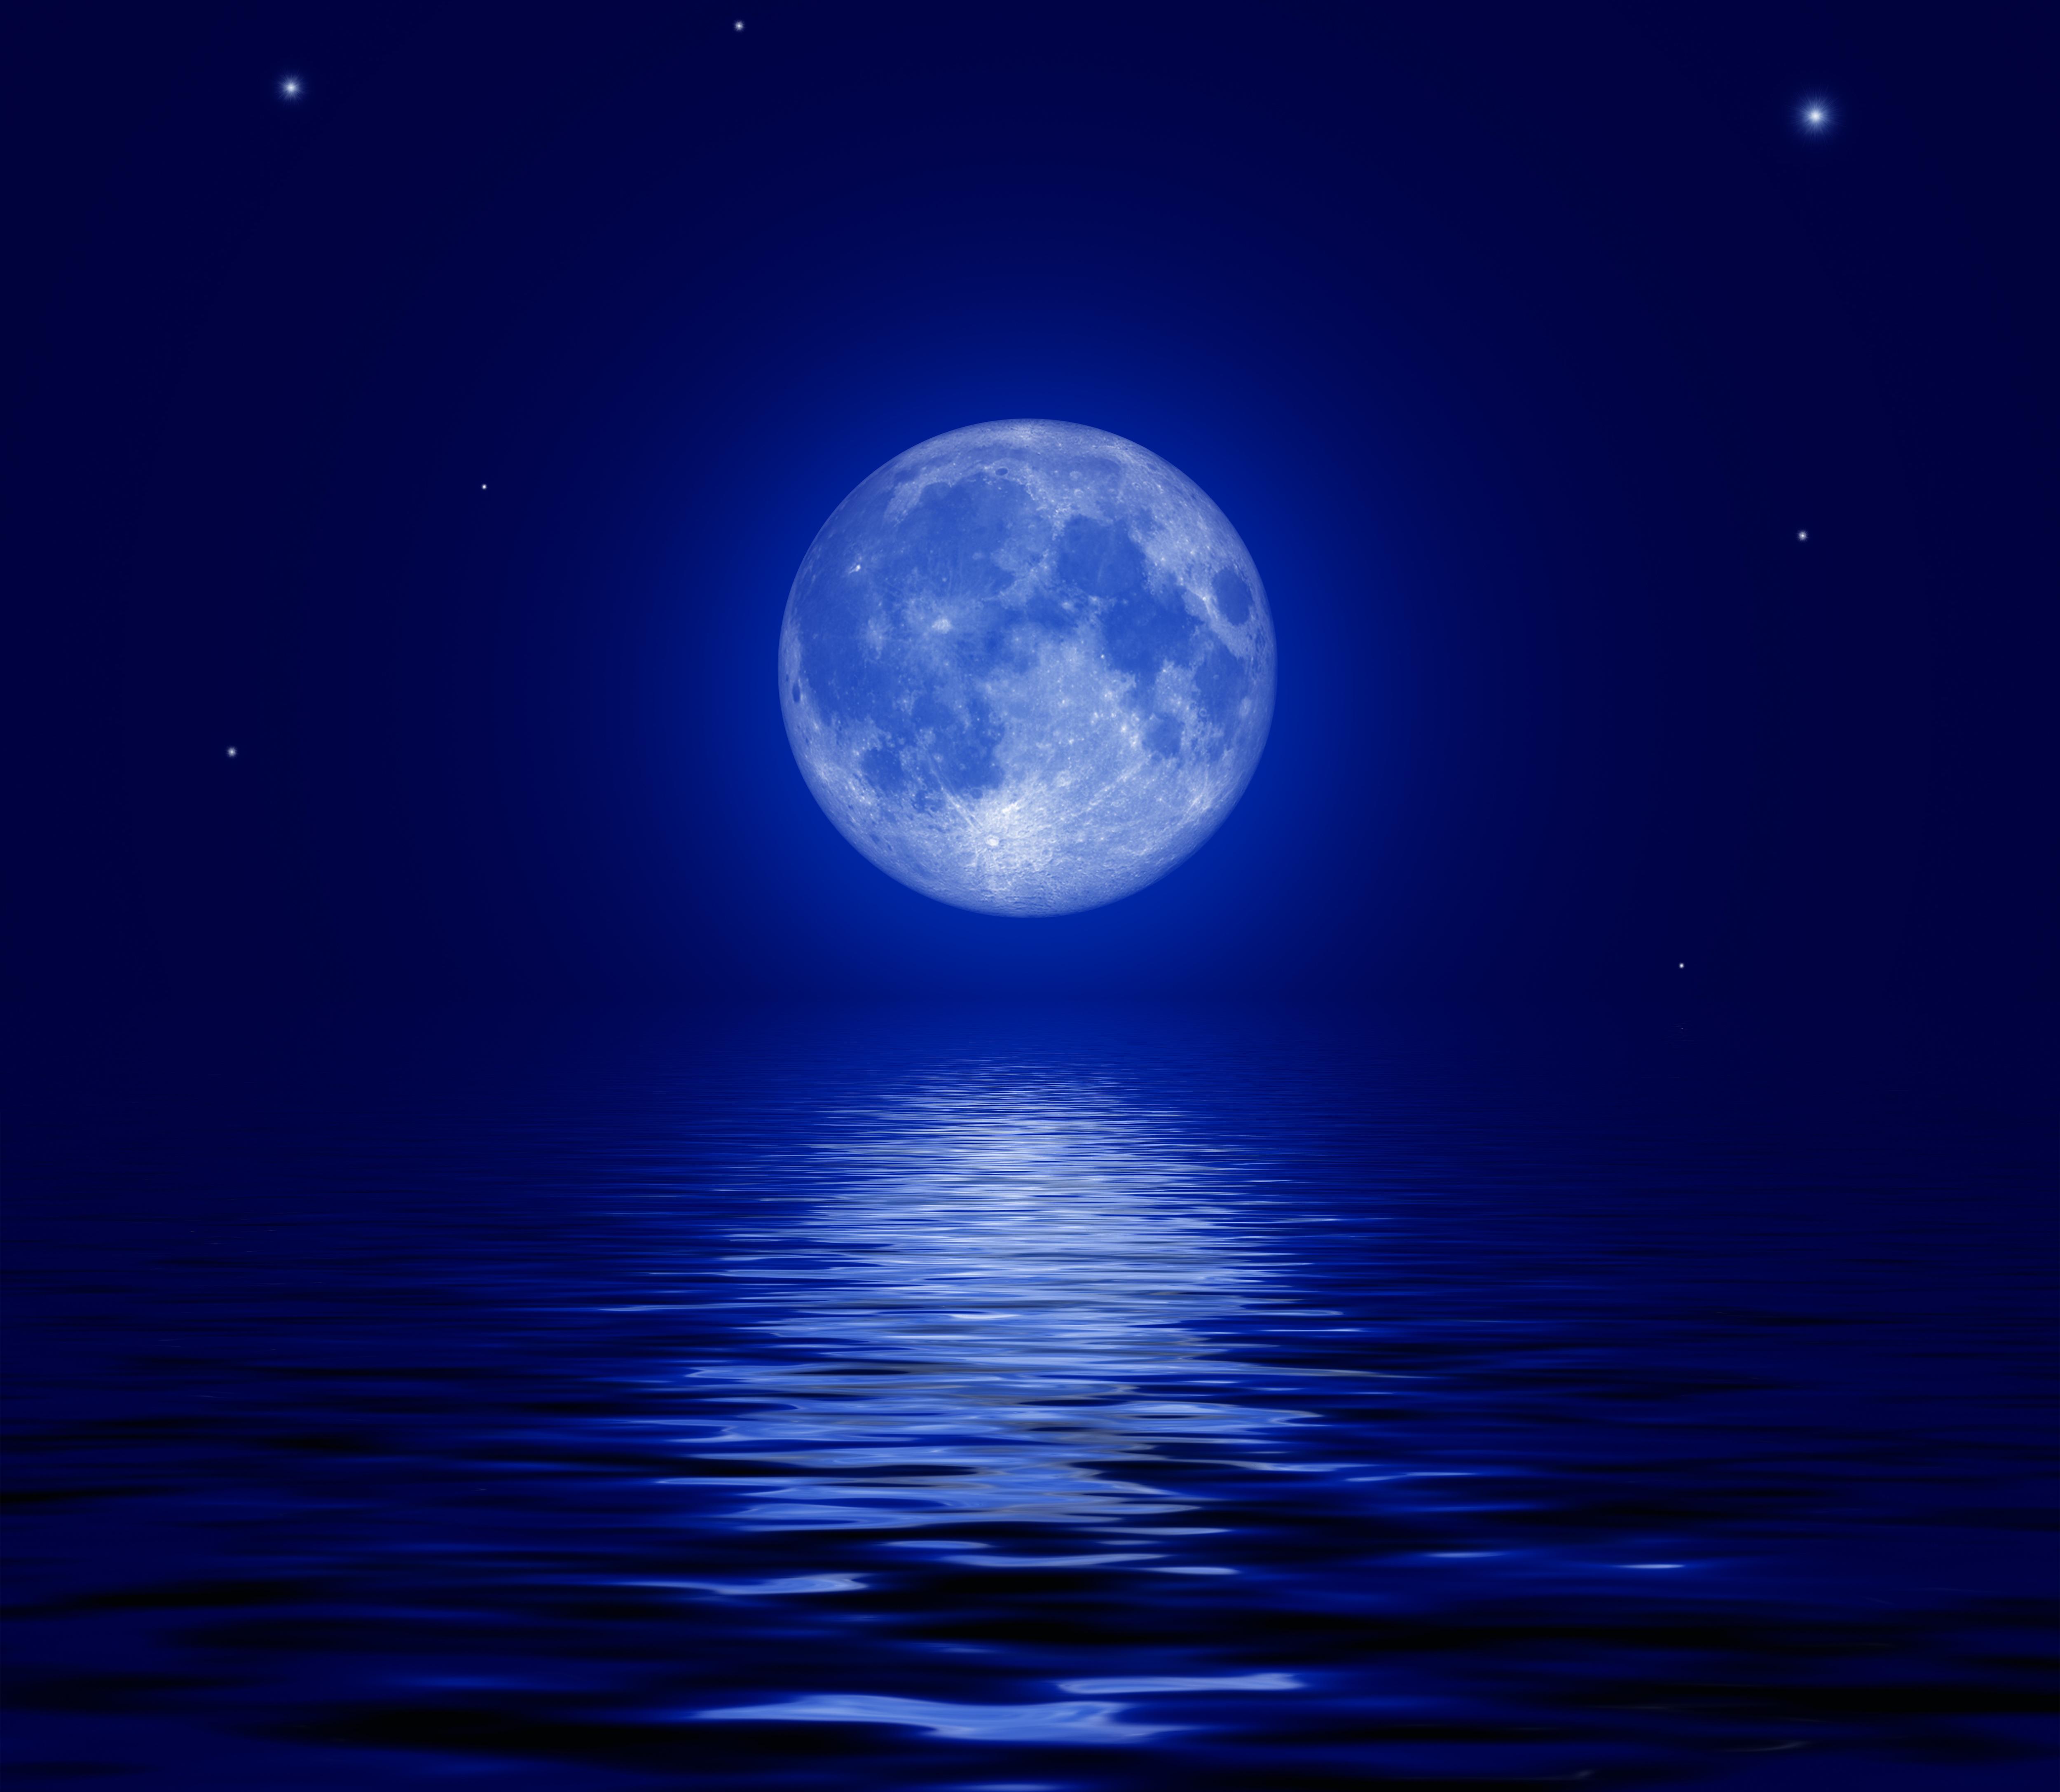 Фото луна ночь